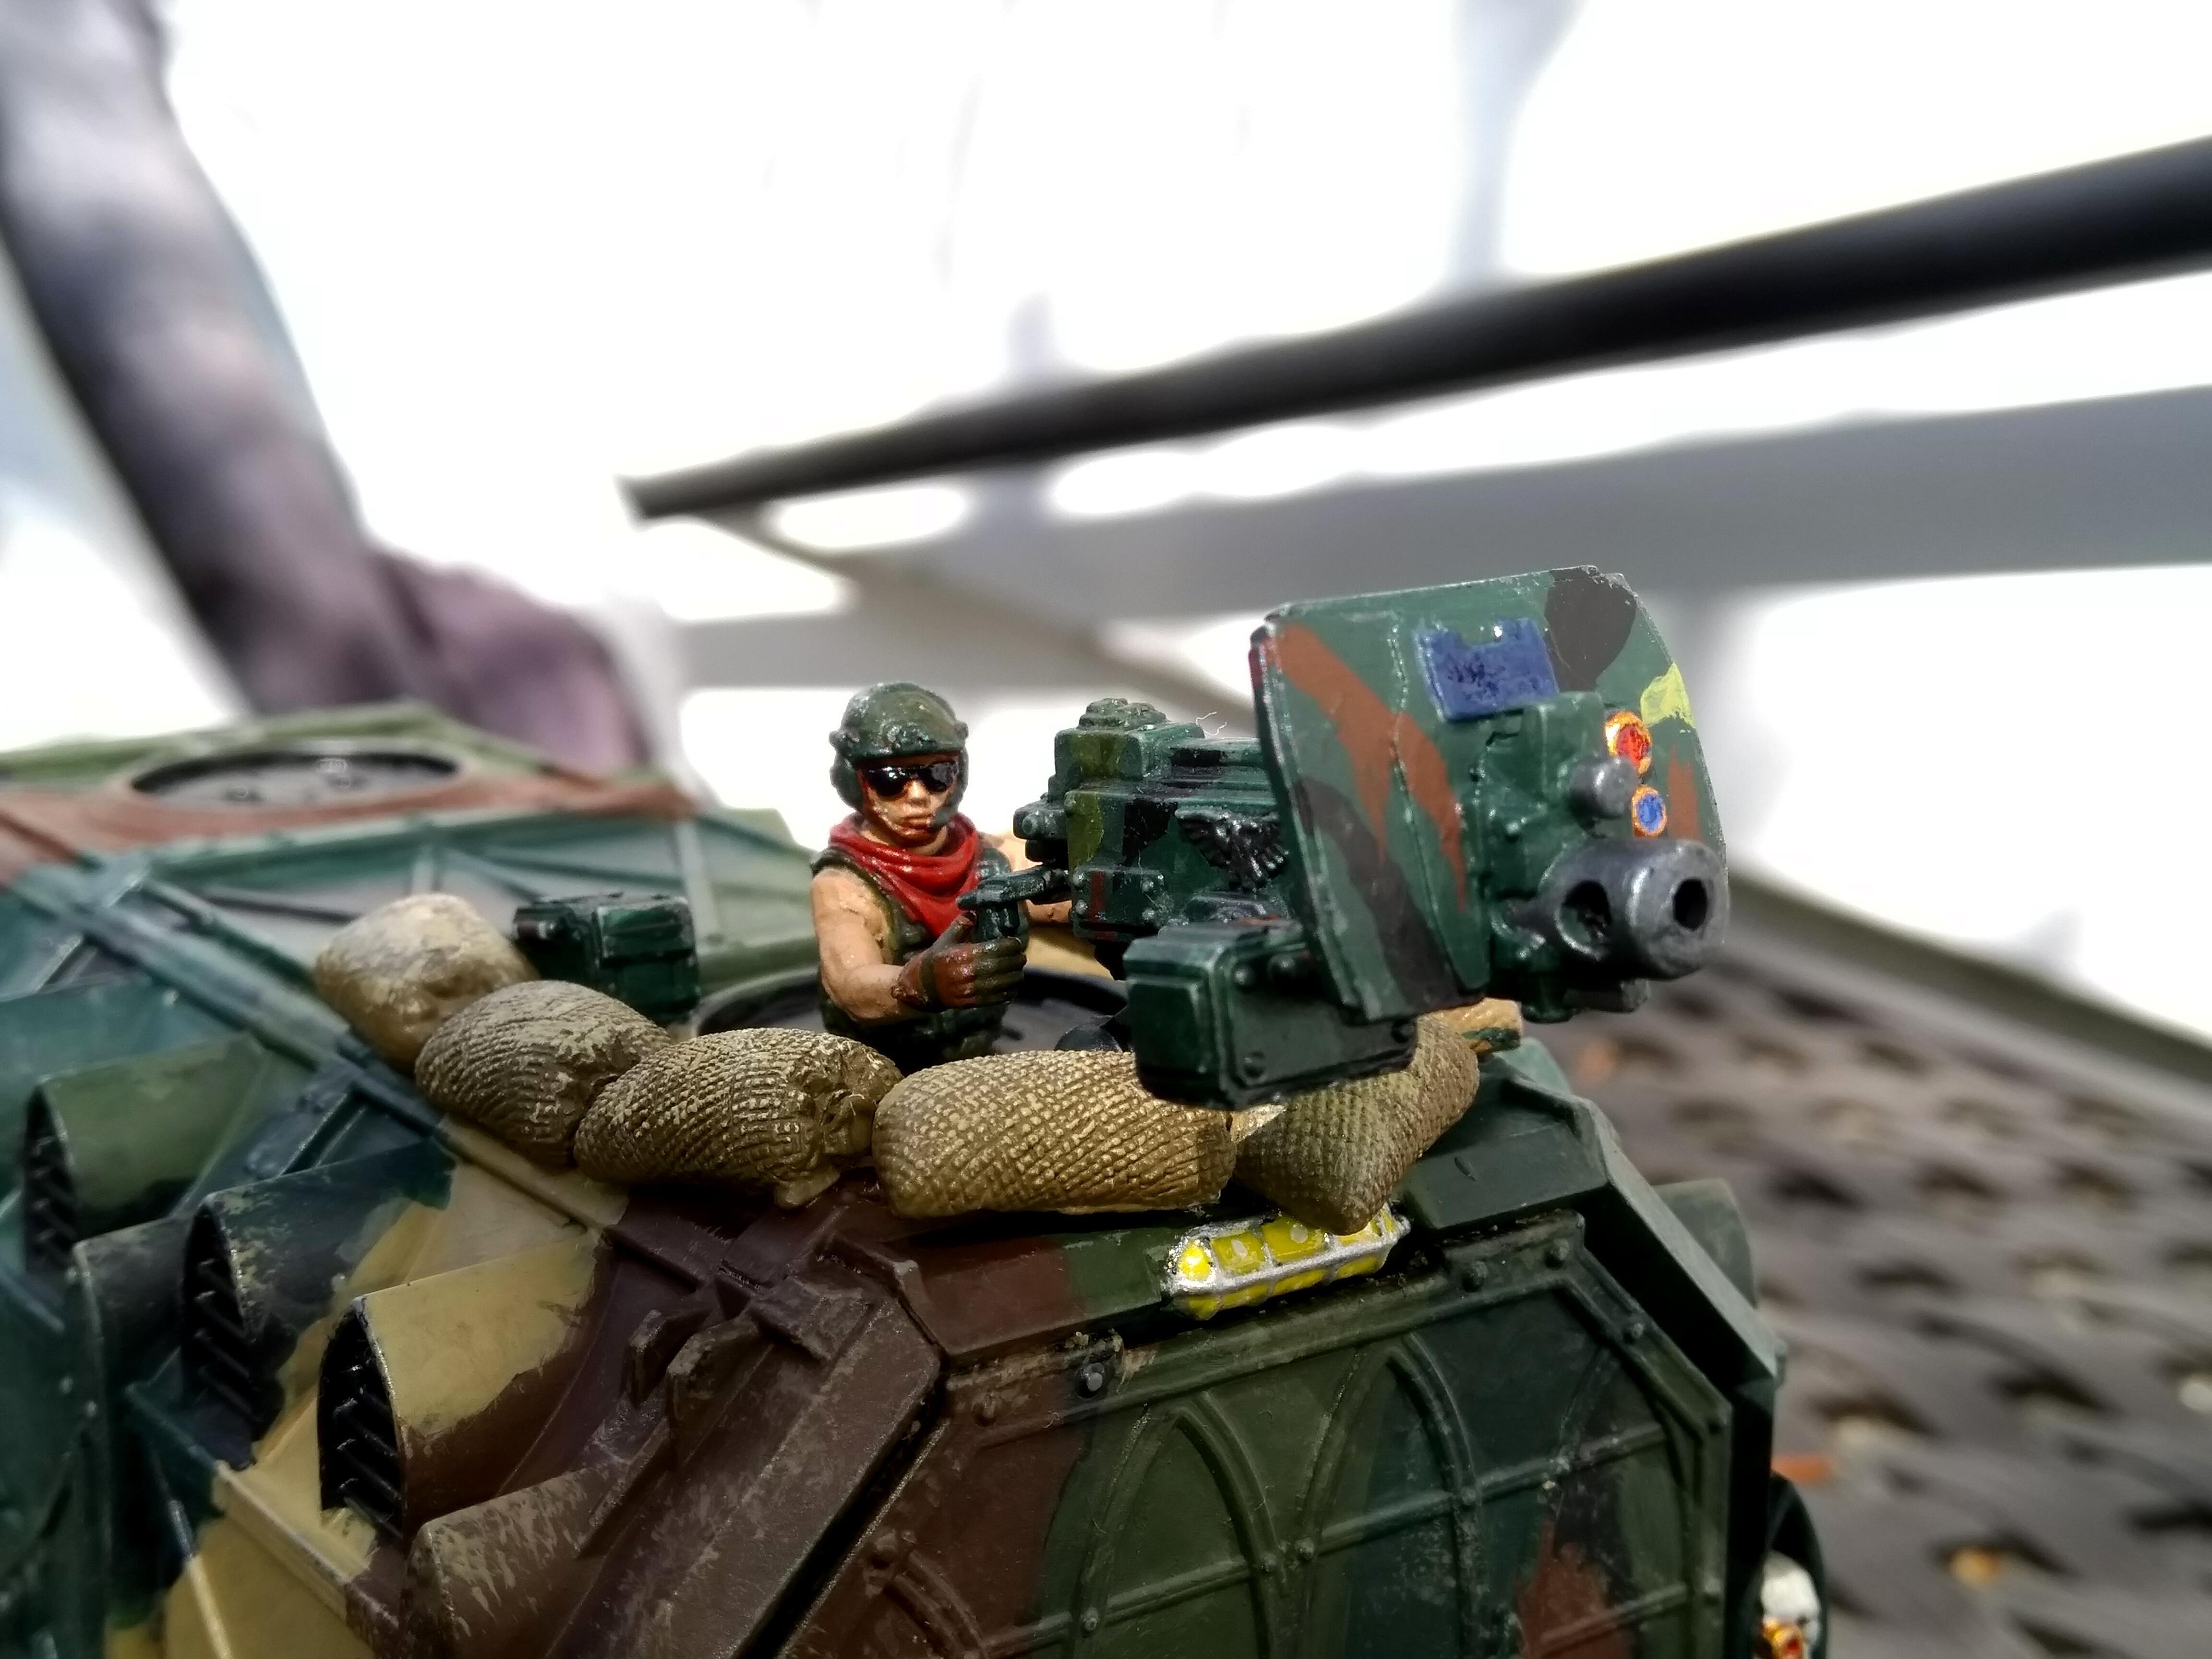 Apc, Catachan, Heavy Bolter, Imperial Guard, Road Train